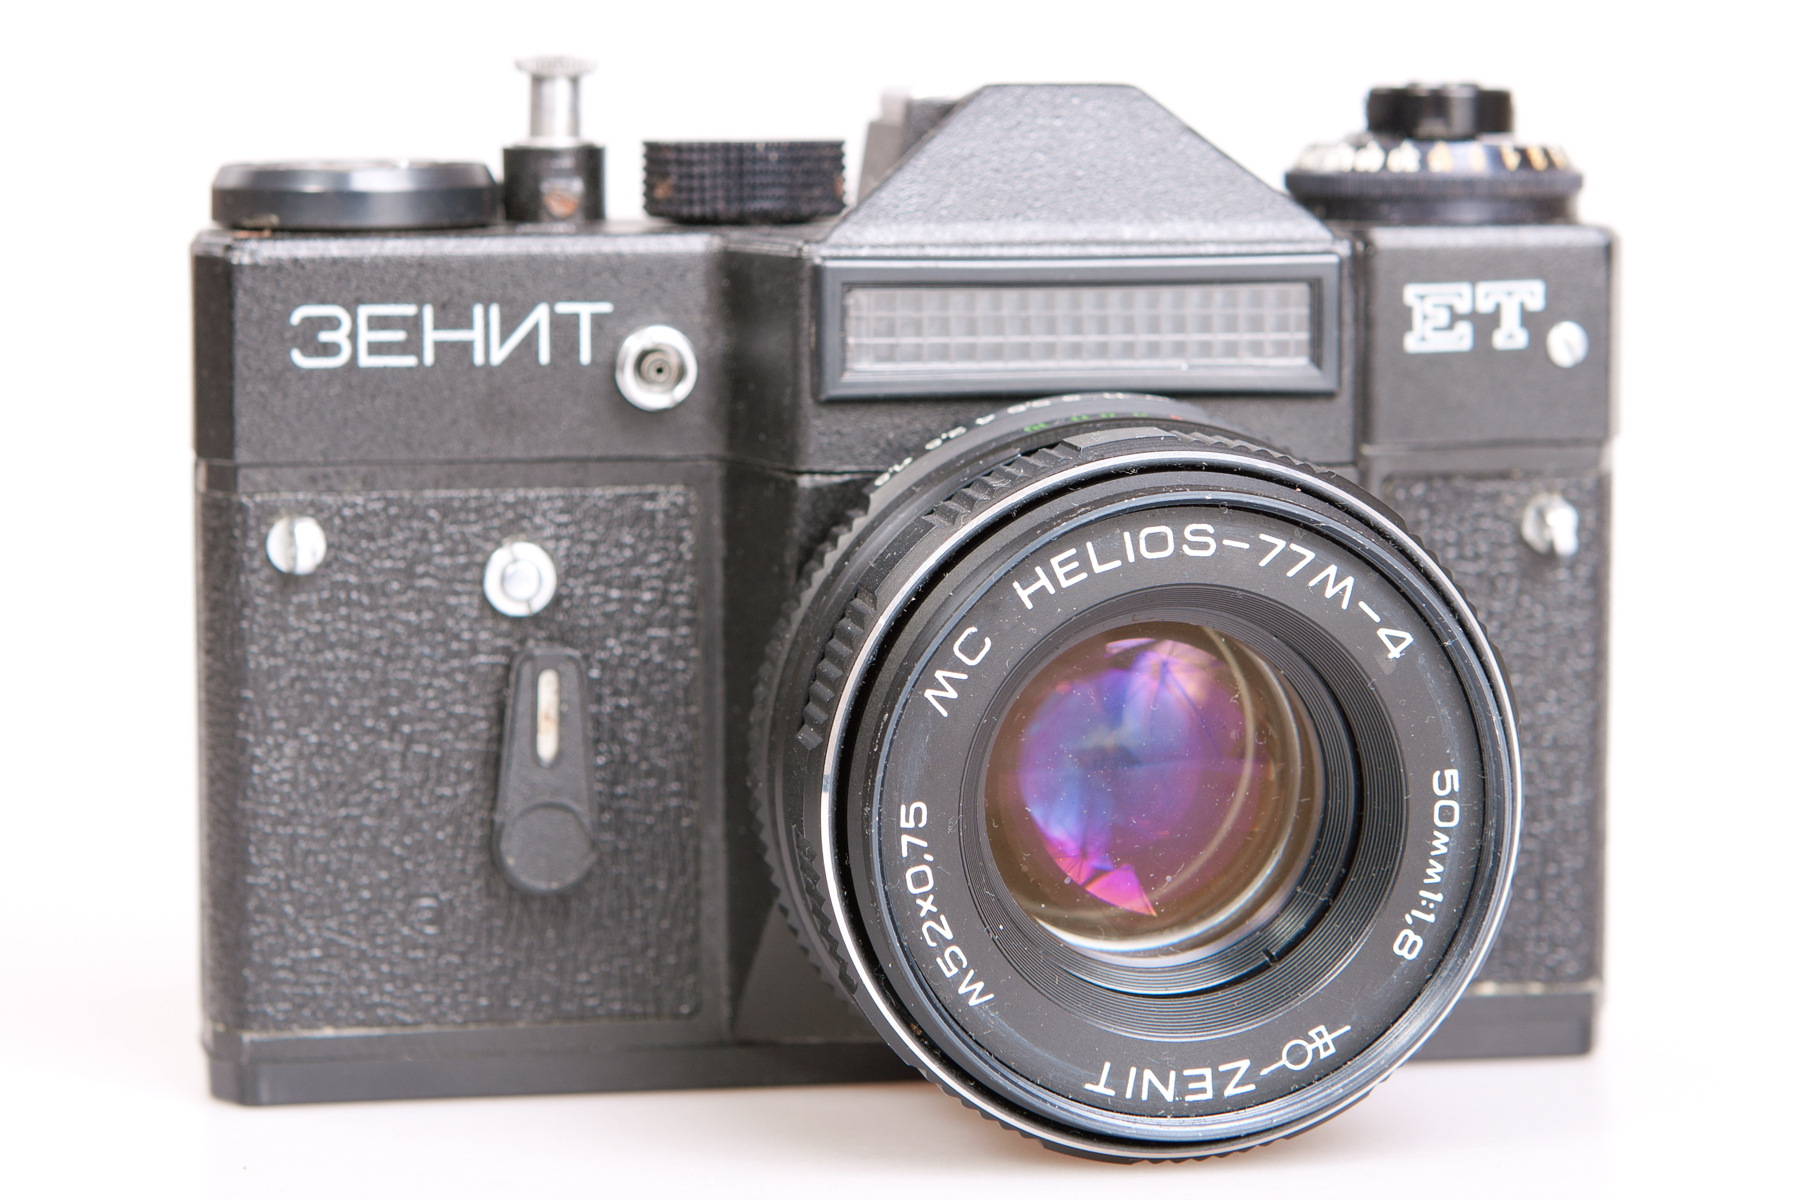 Camera, Antique, White, Technology, Revival, HQ Photo